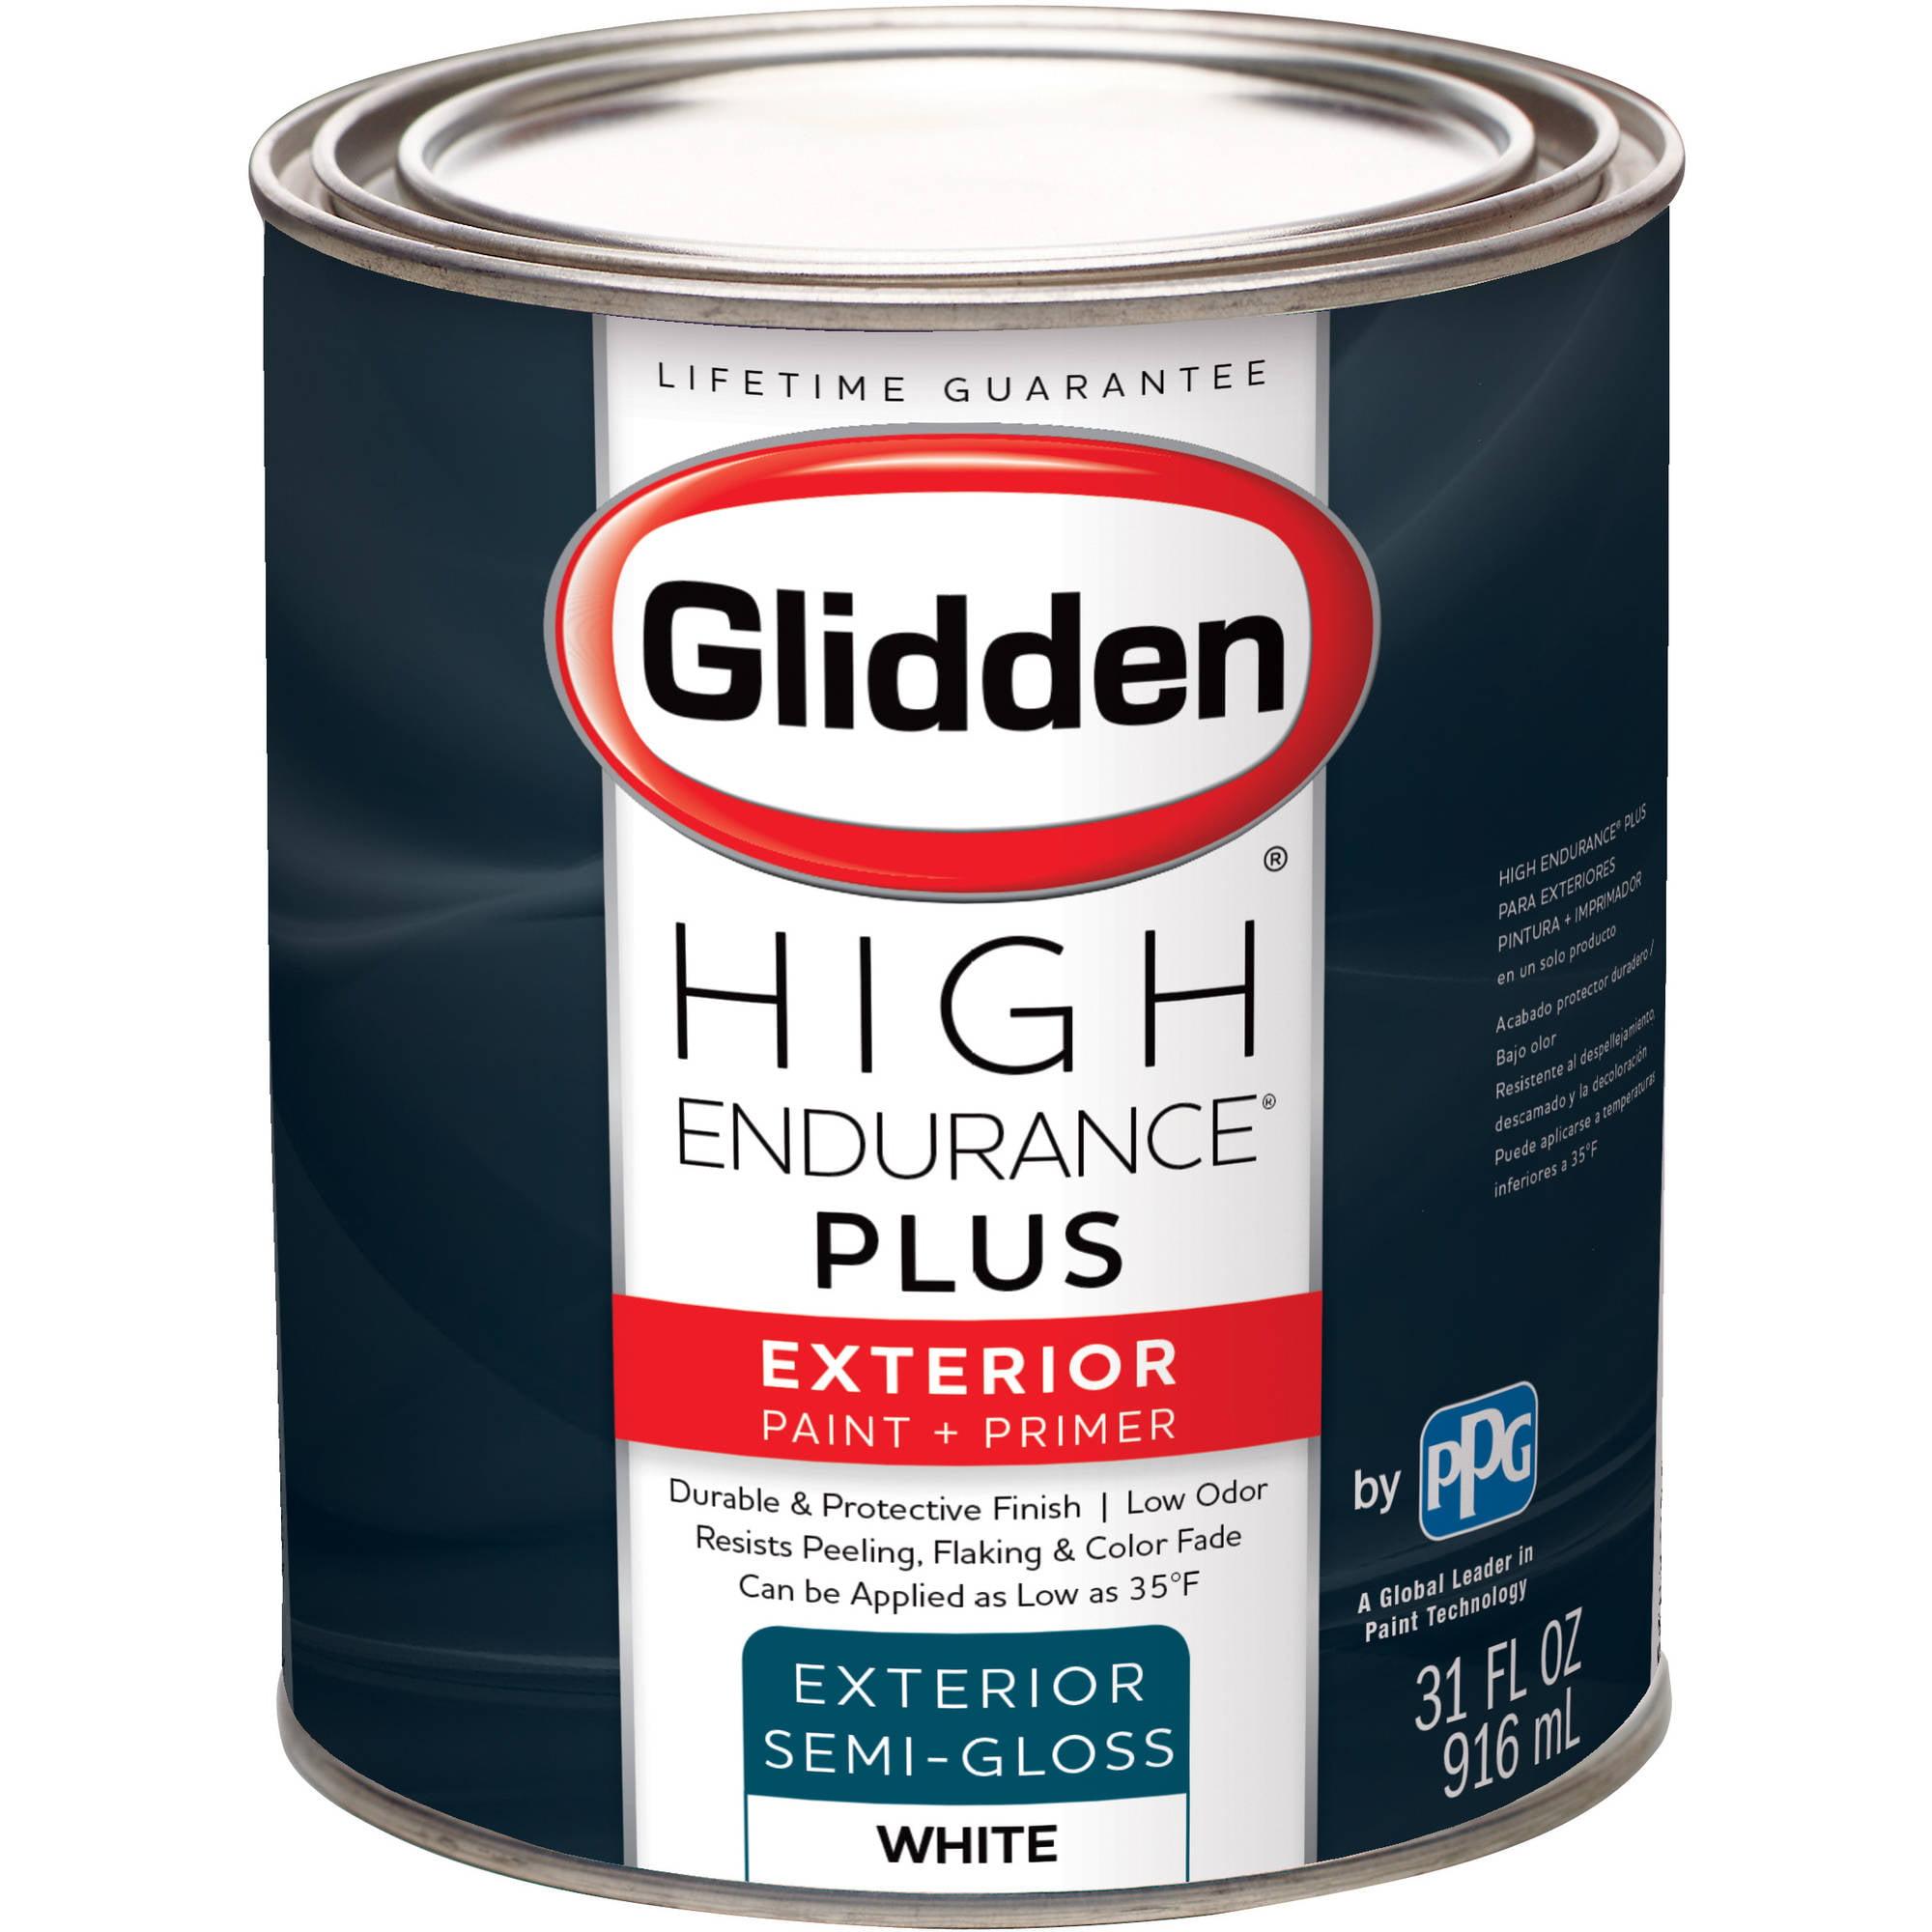 Glidden High Endurance Plus, Exterior Paint and Primer, Semi-Gloss ...